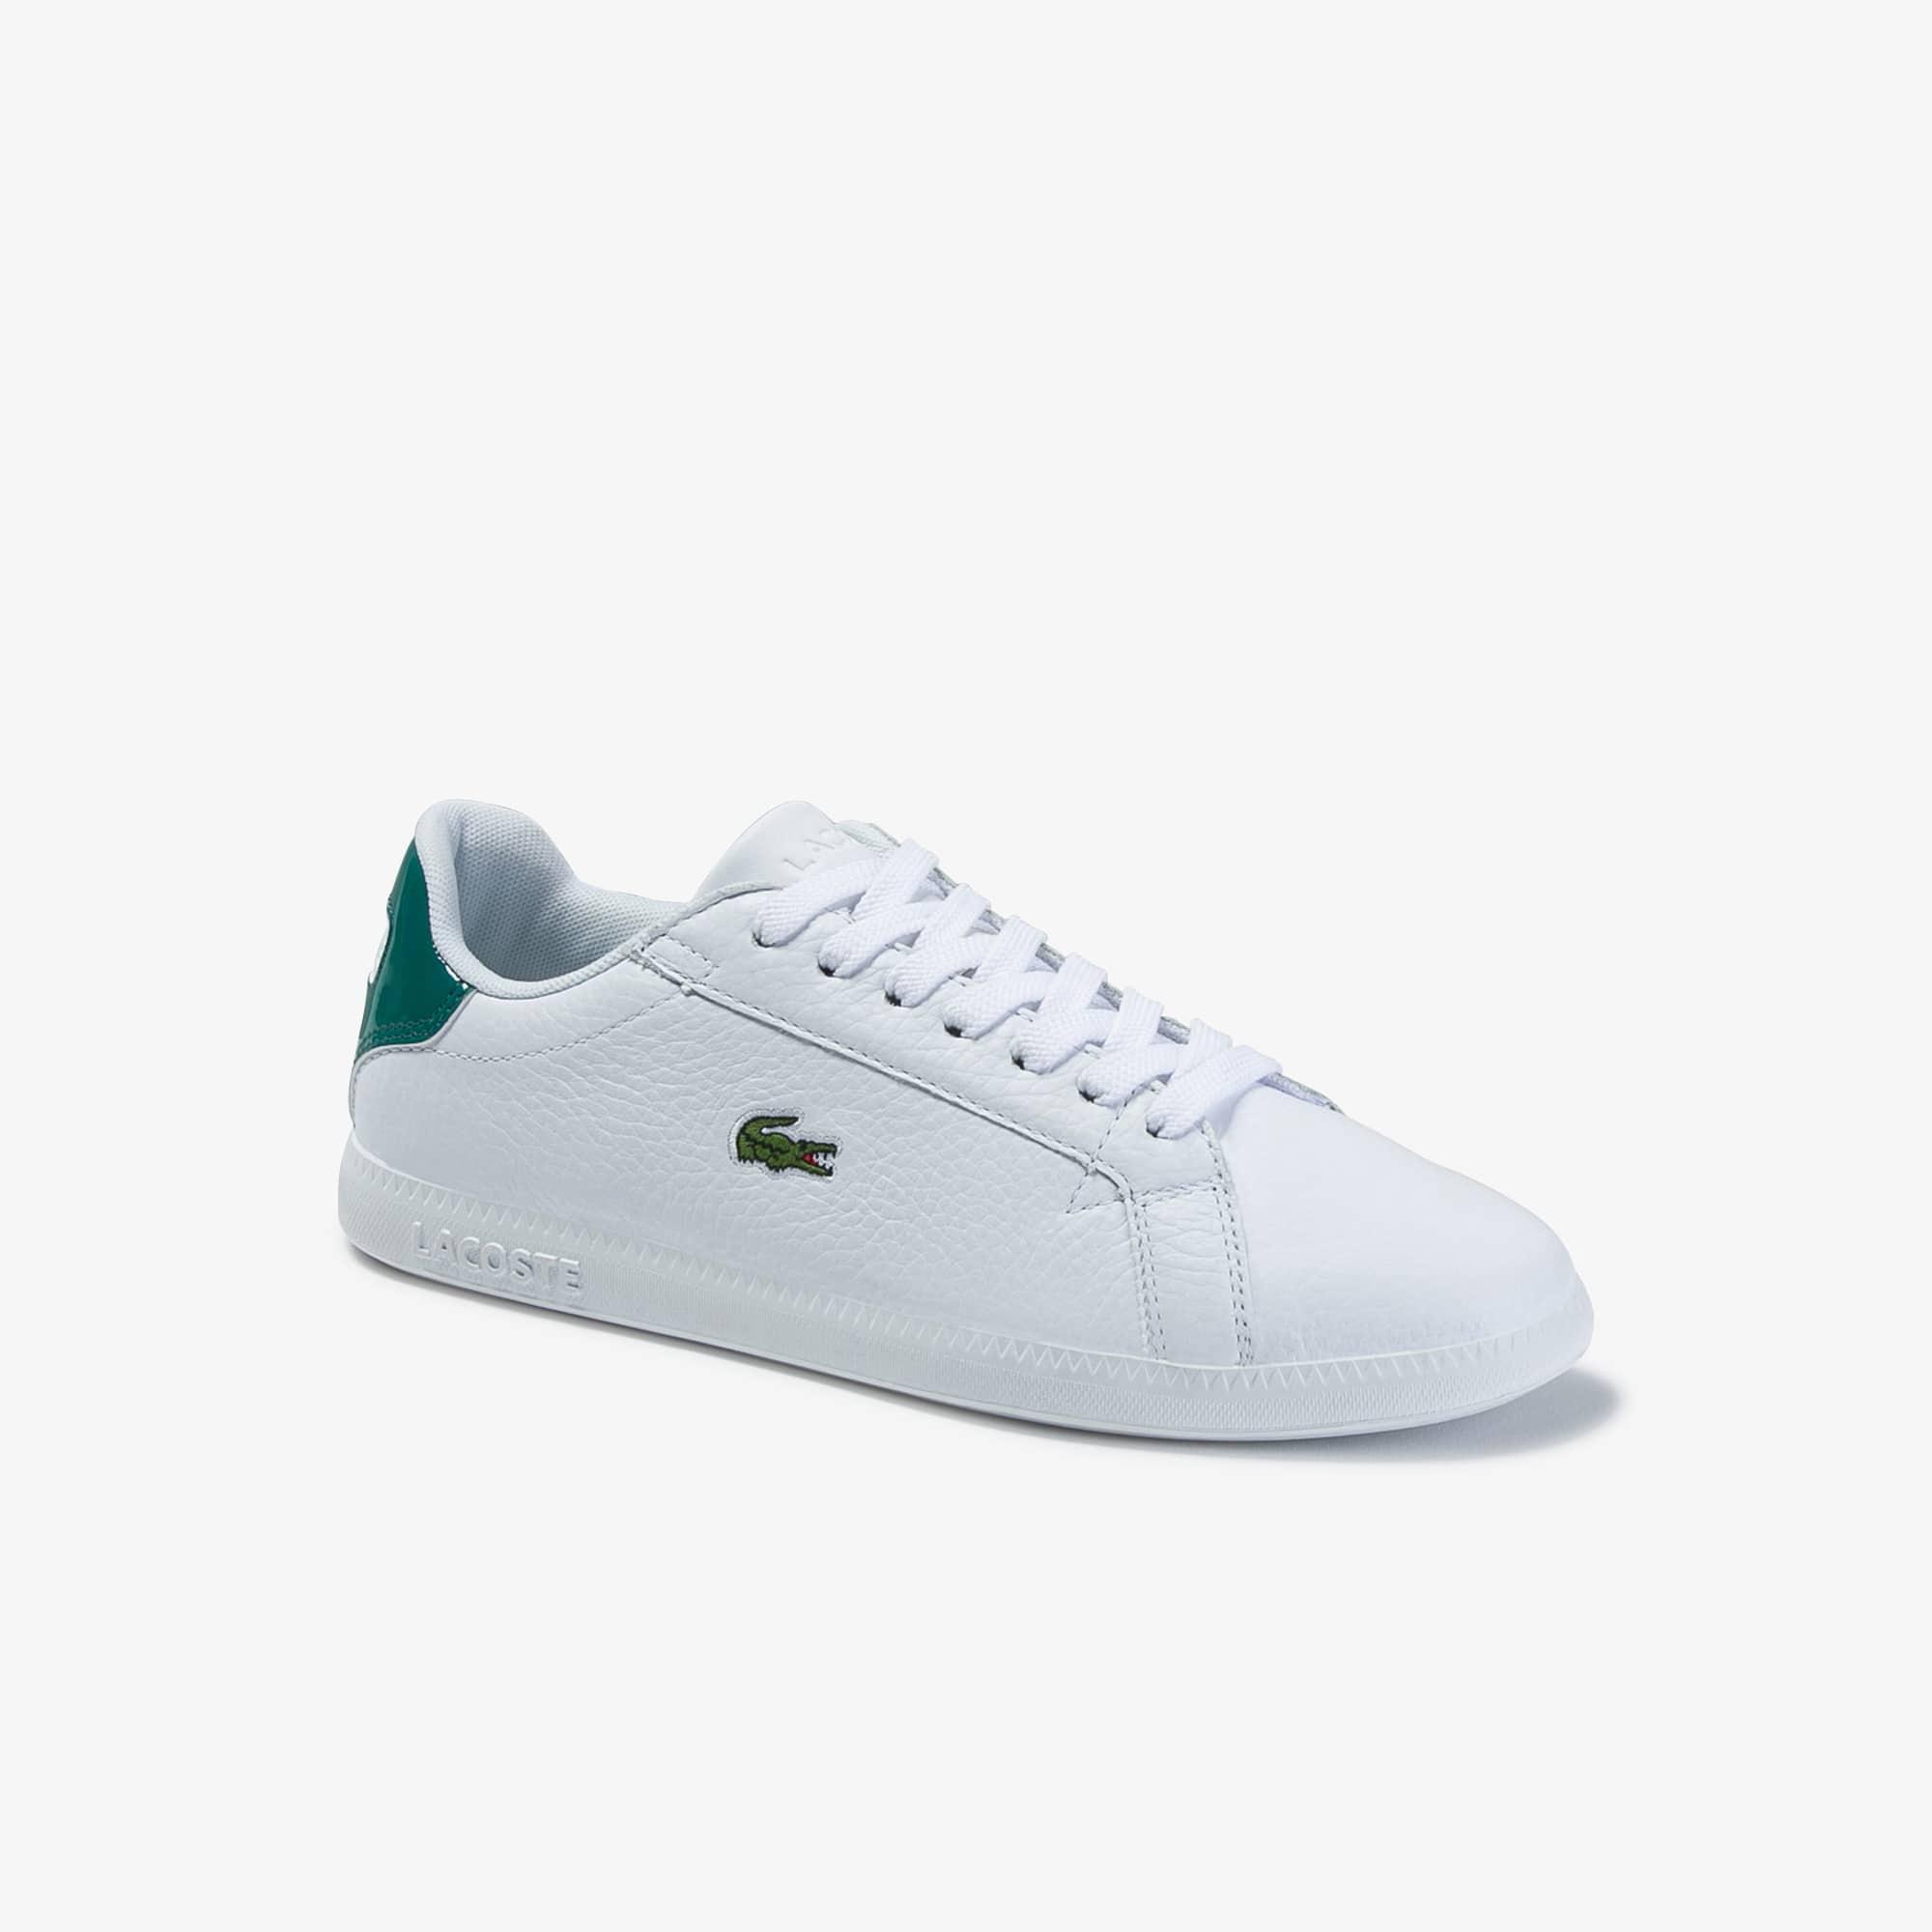 Damen-Sneakers GRADUATE aus Leder